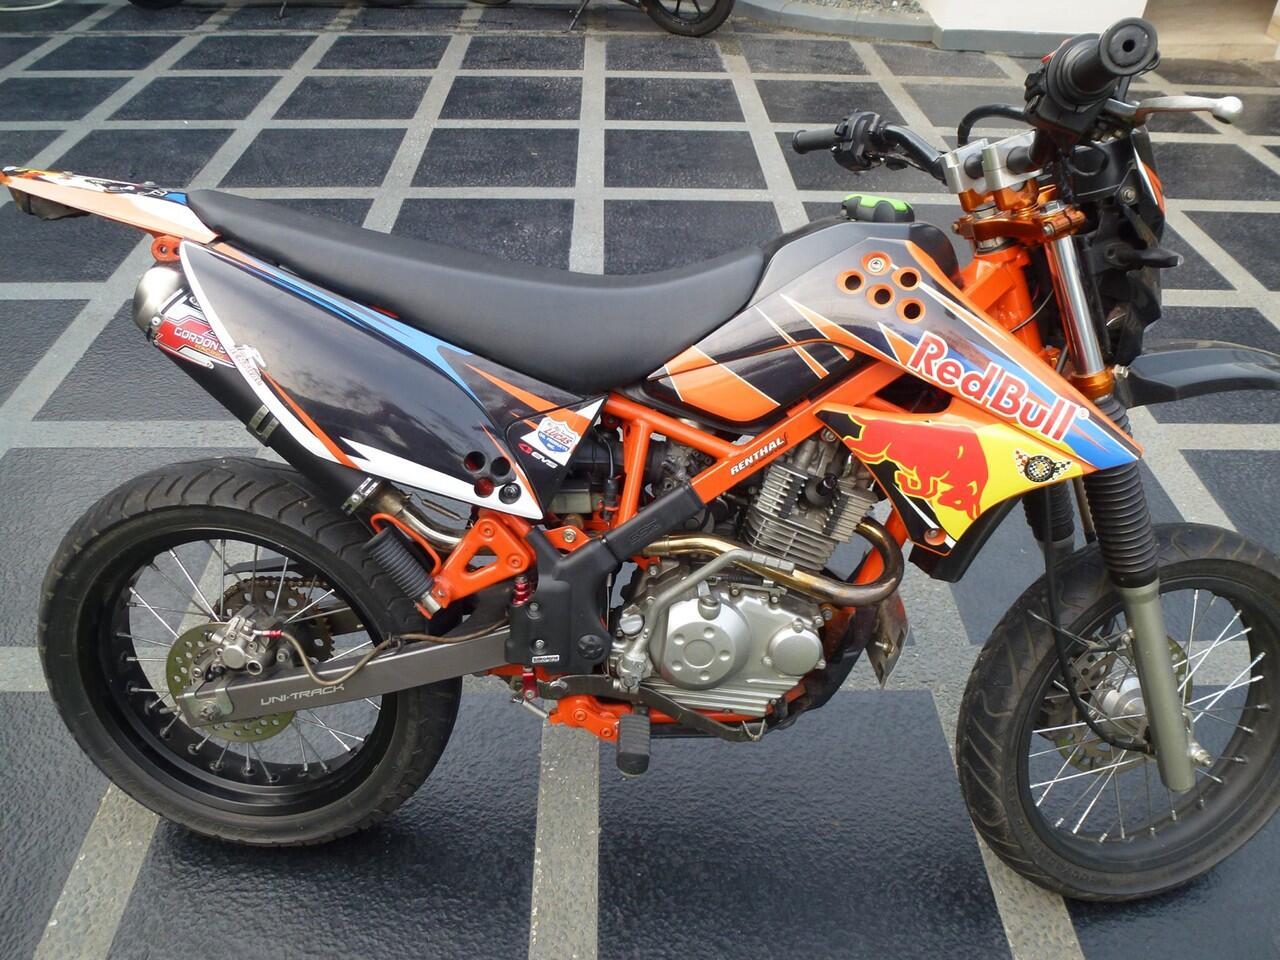 Kawasaki D Tracker Modifikasi Supermoto Kawasaki Klx 150